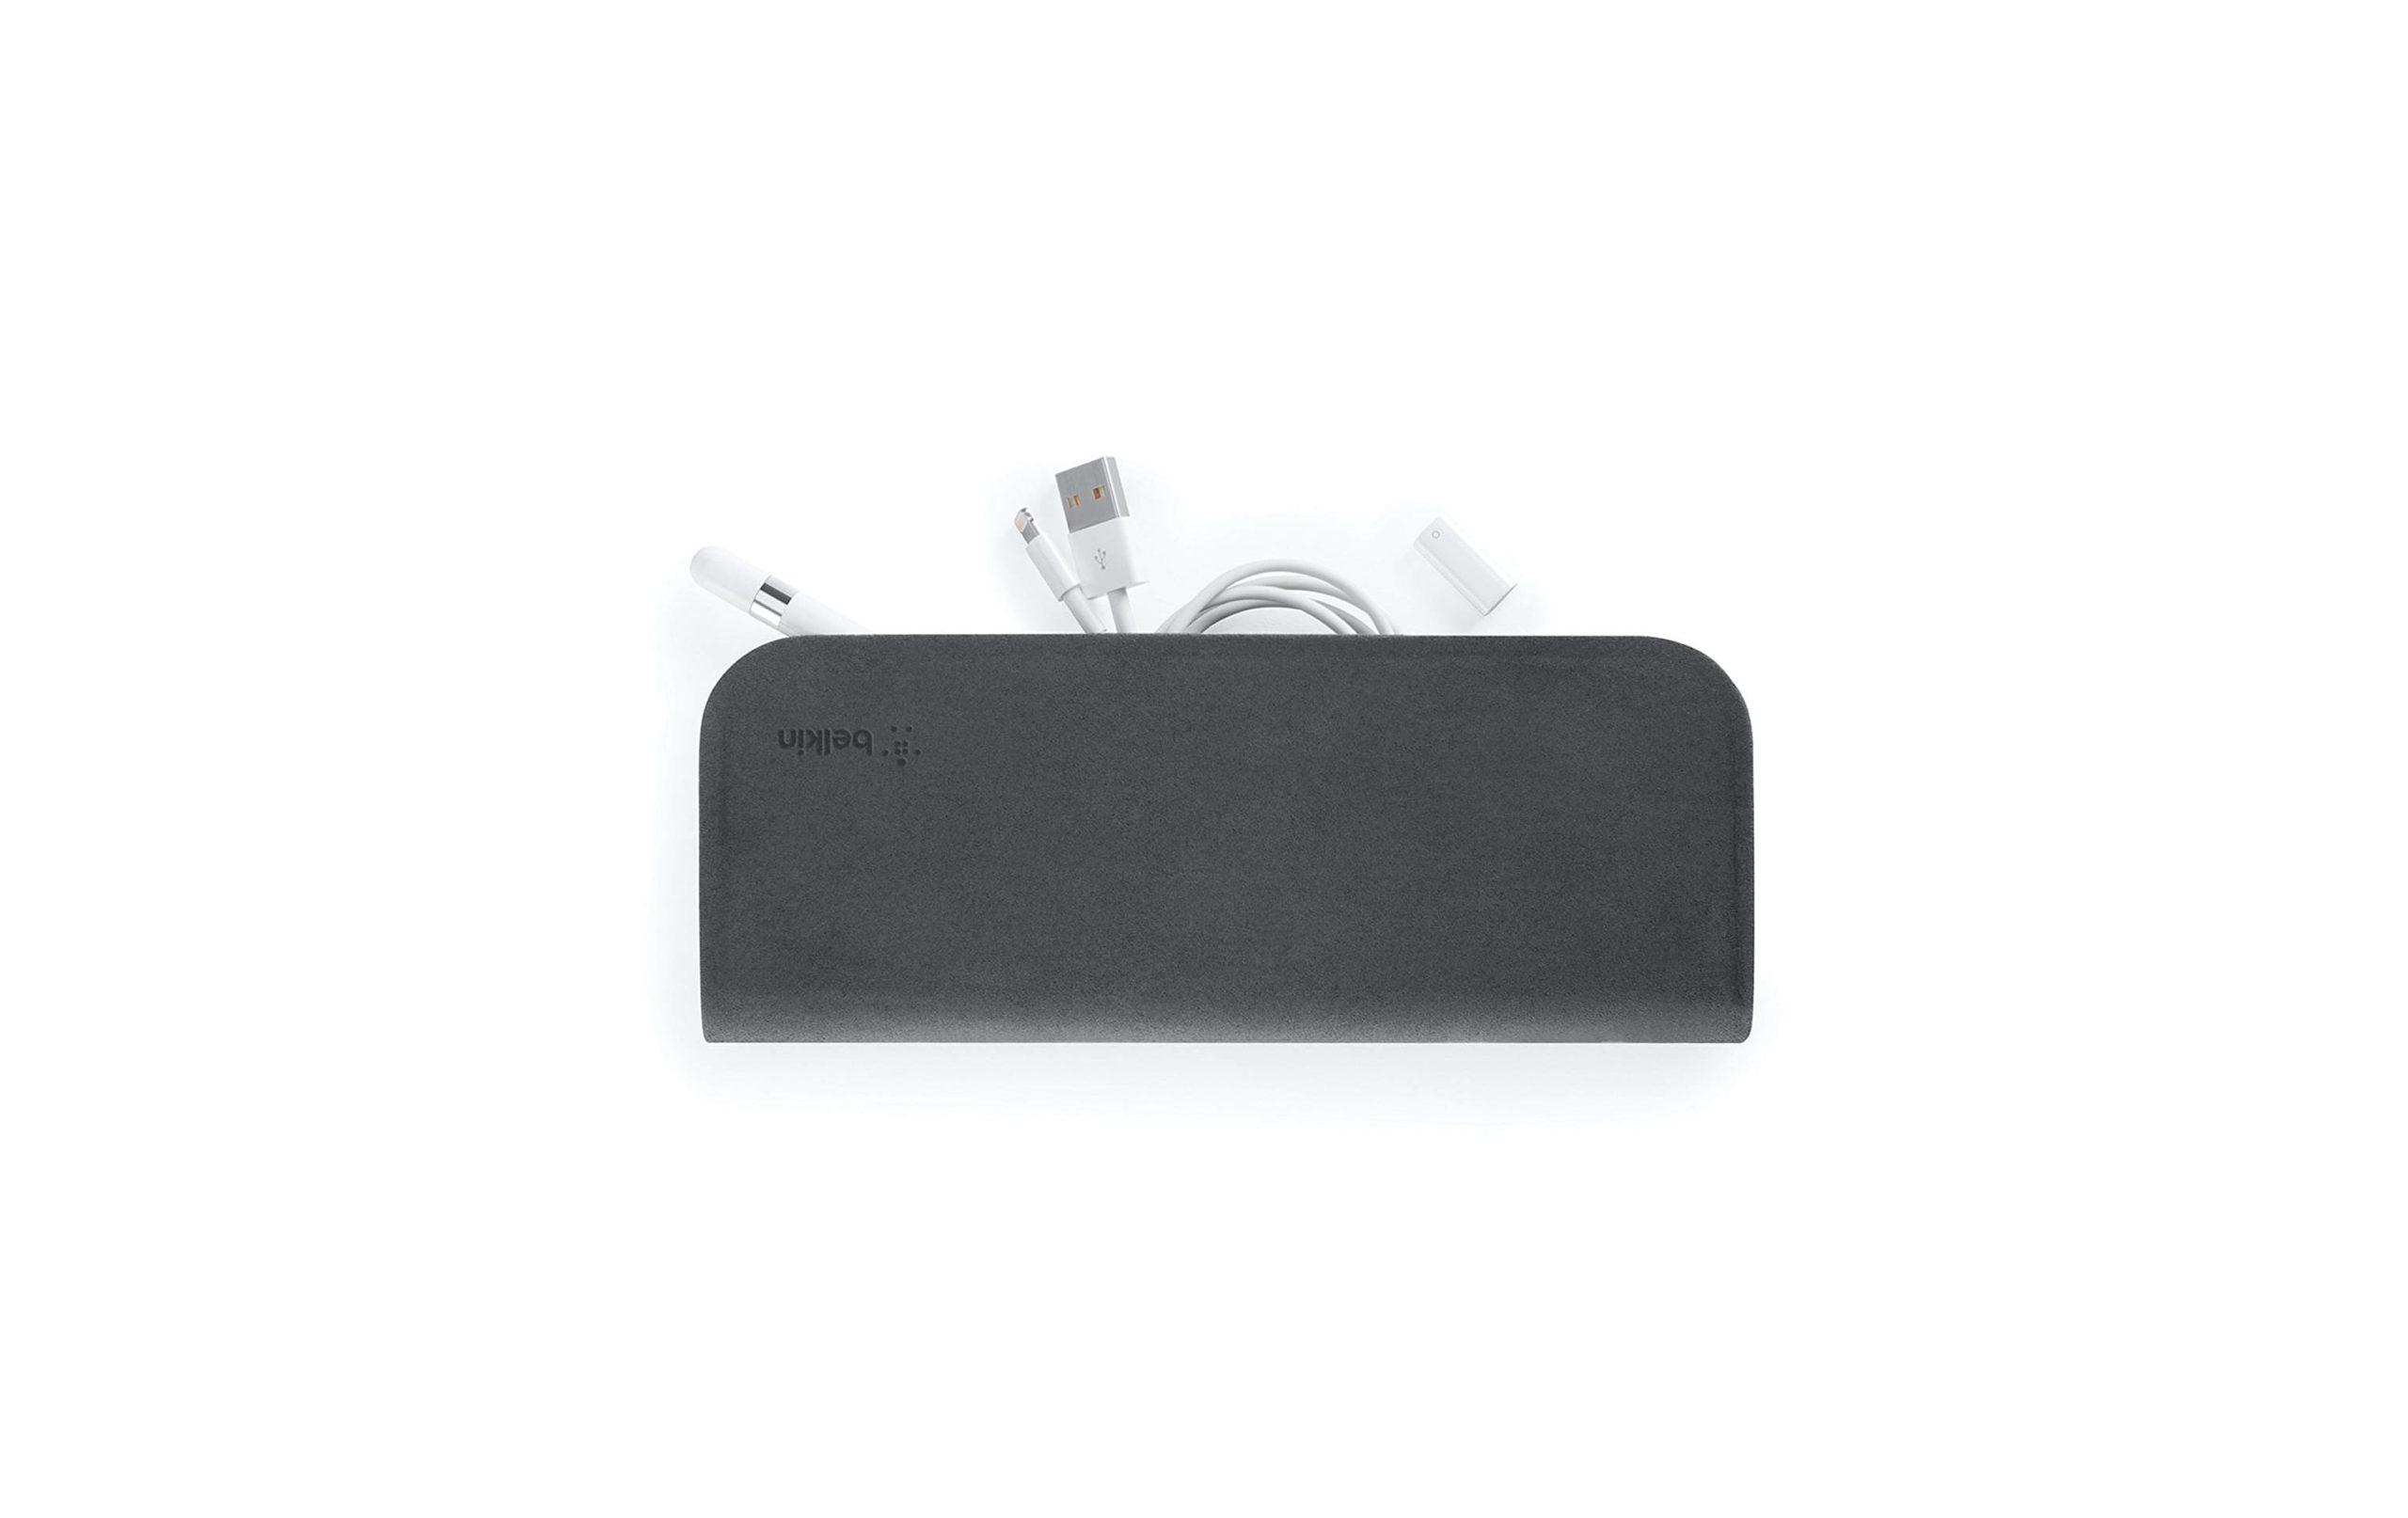 Belkin F8W792btC00 Carrying Case for Apple Pencil with Built-in Zipper Pocket - Black -min